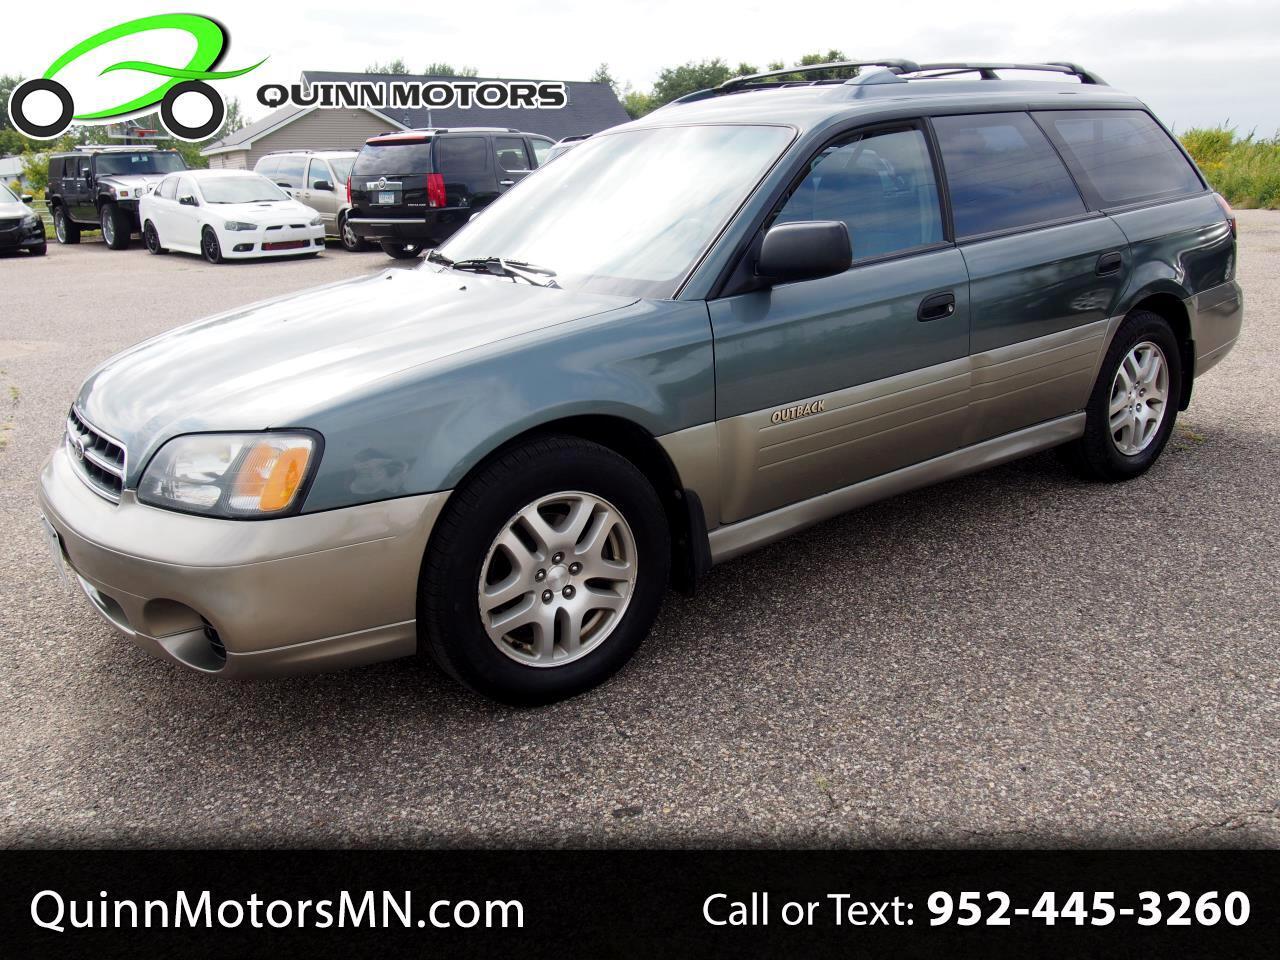 2002 Subaru Legacy Wagon 5dr Outback Auto w/All Weather Pkg